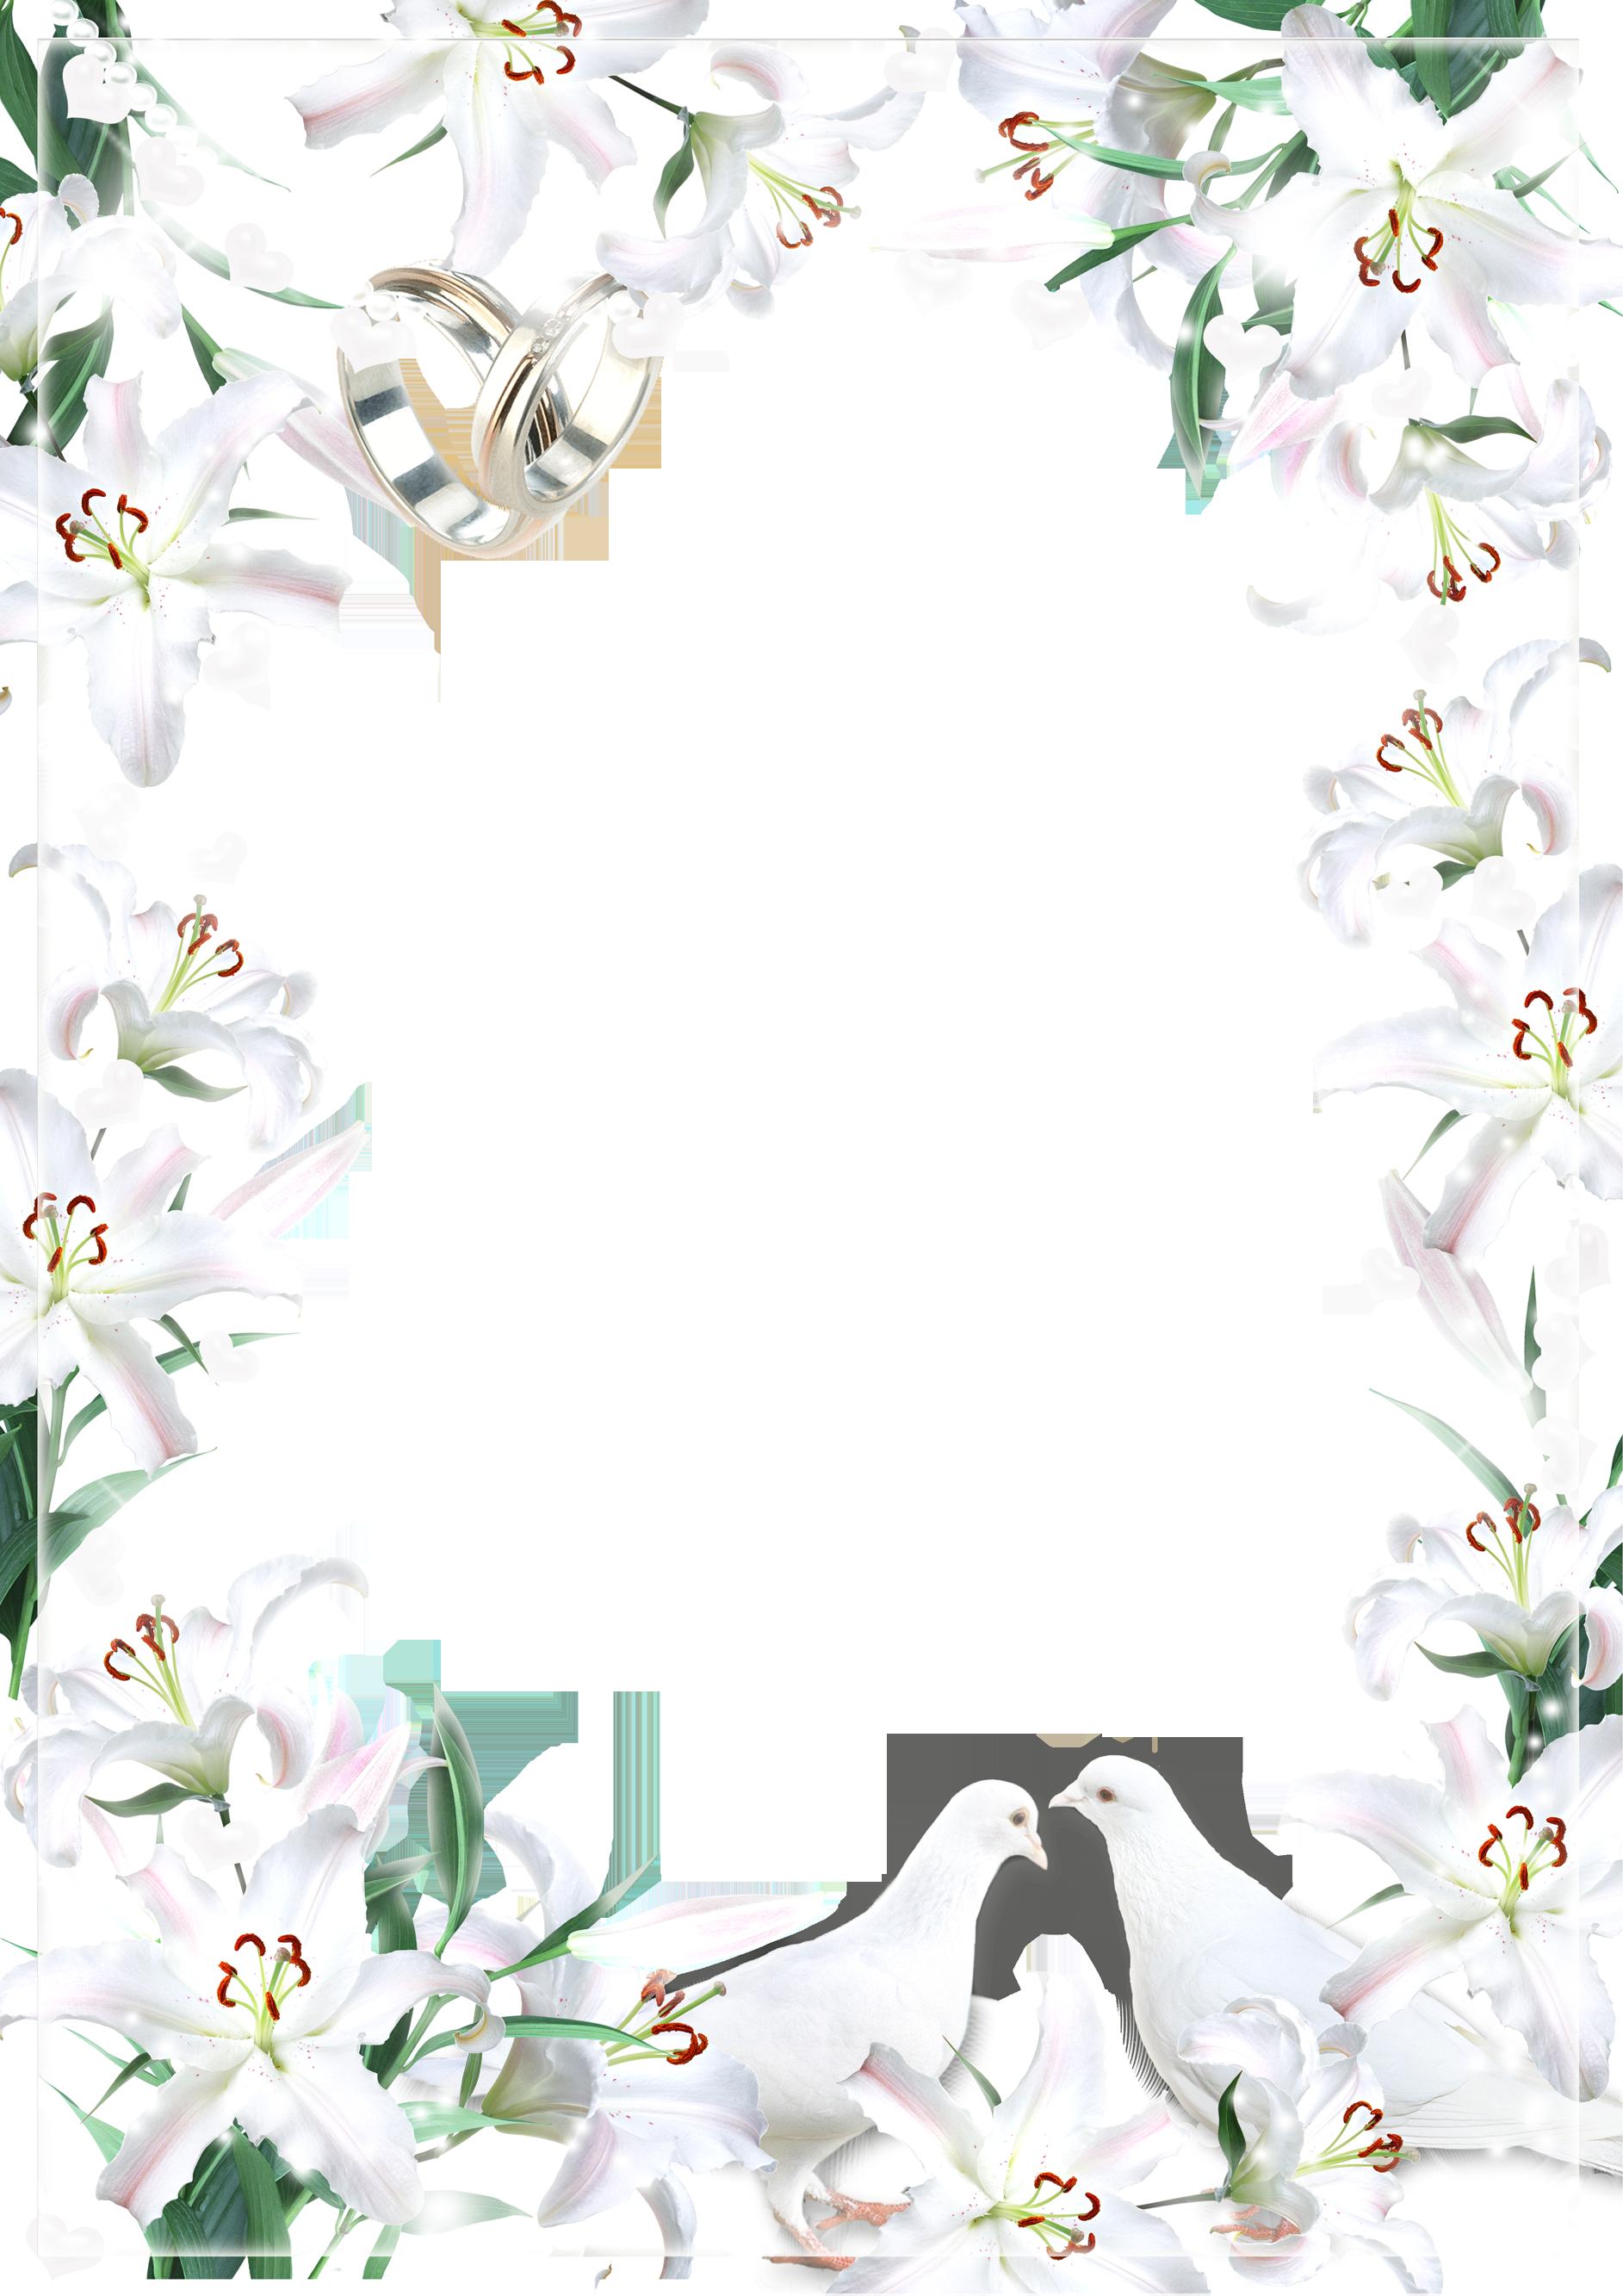 Among The White Lilies Frame Wedding White Wedding Frame White Lilies Wedding Frames